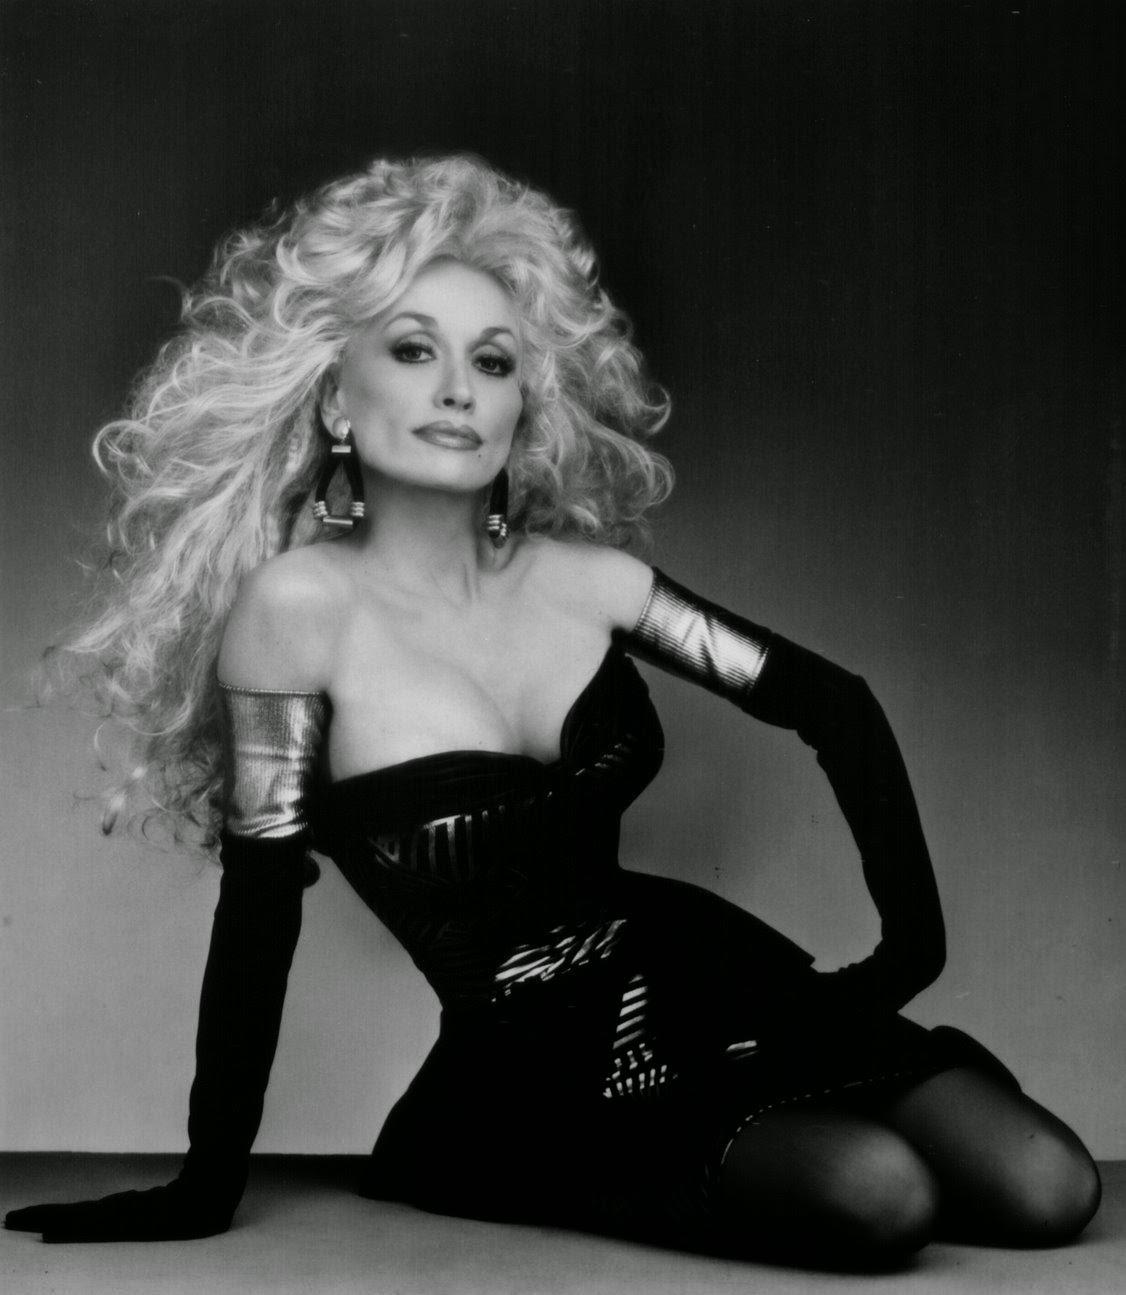 Dolly+Parton,+1970s+(12).jpg